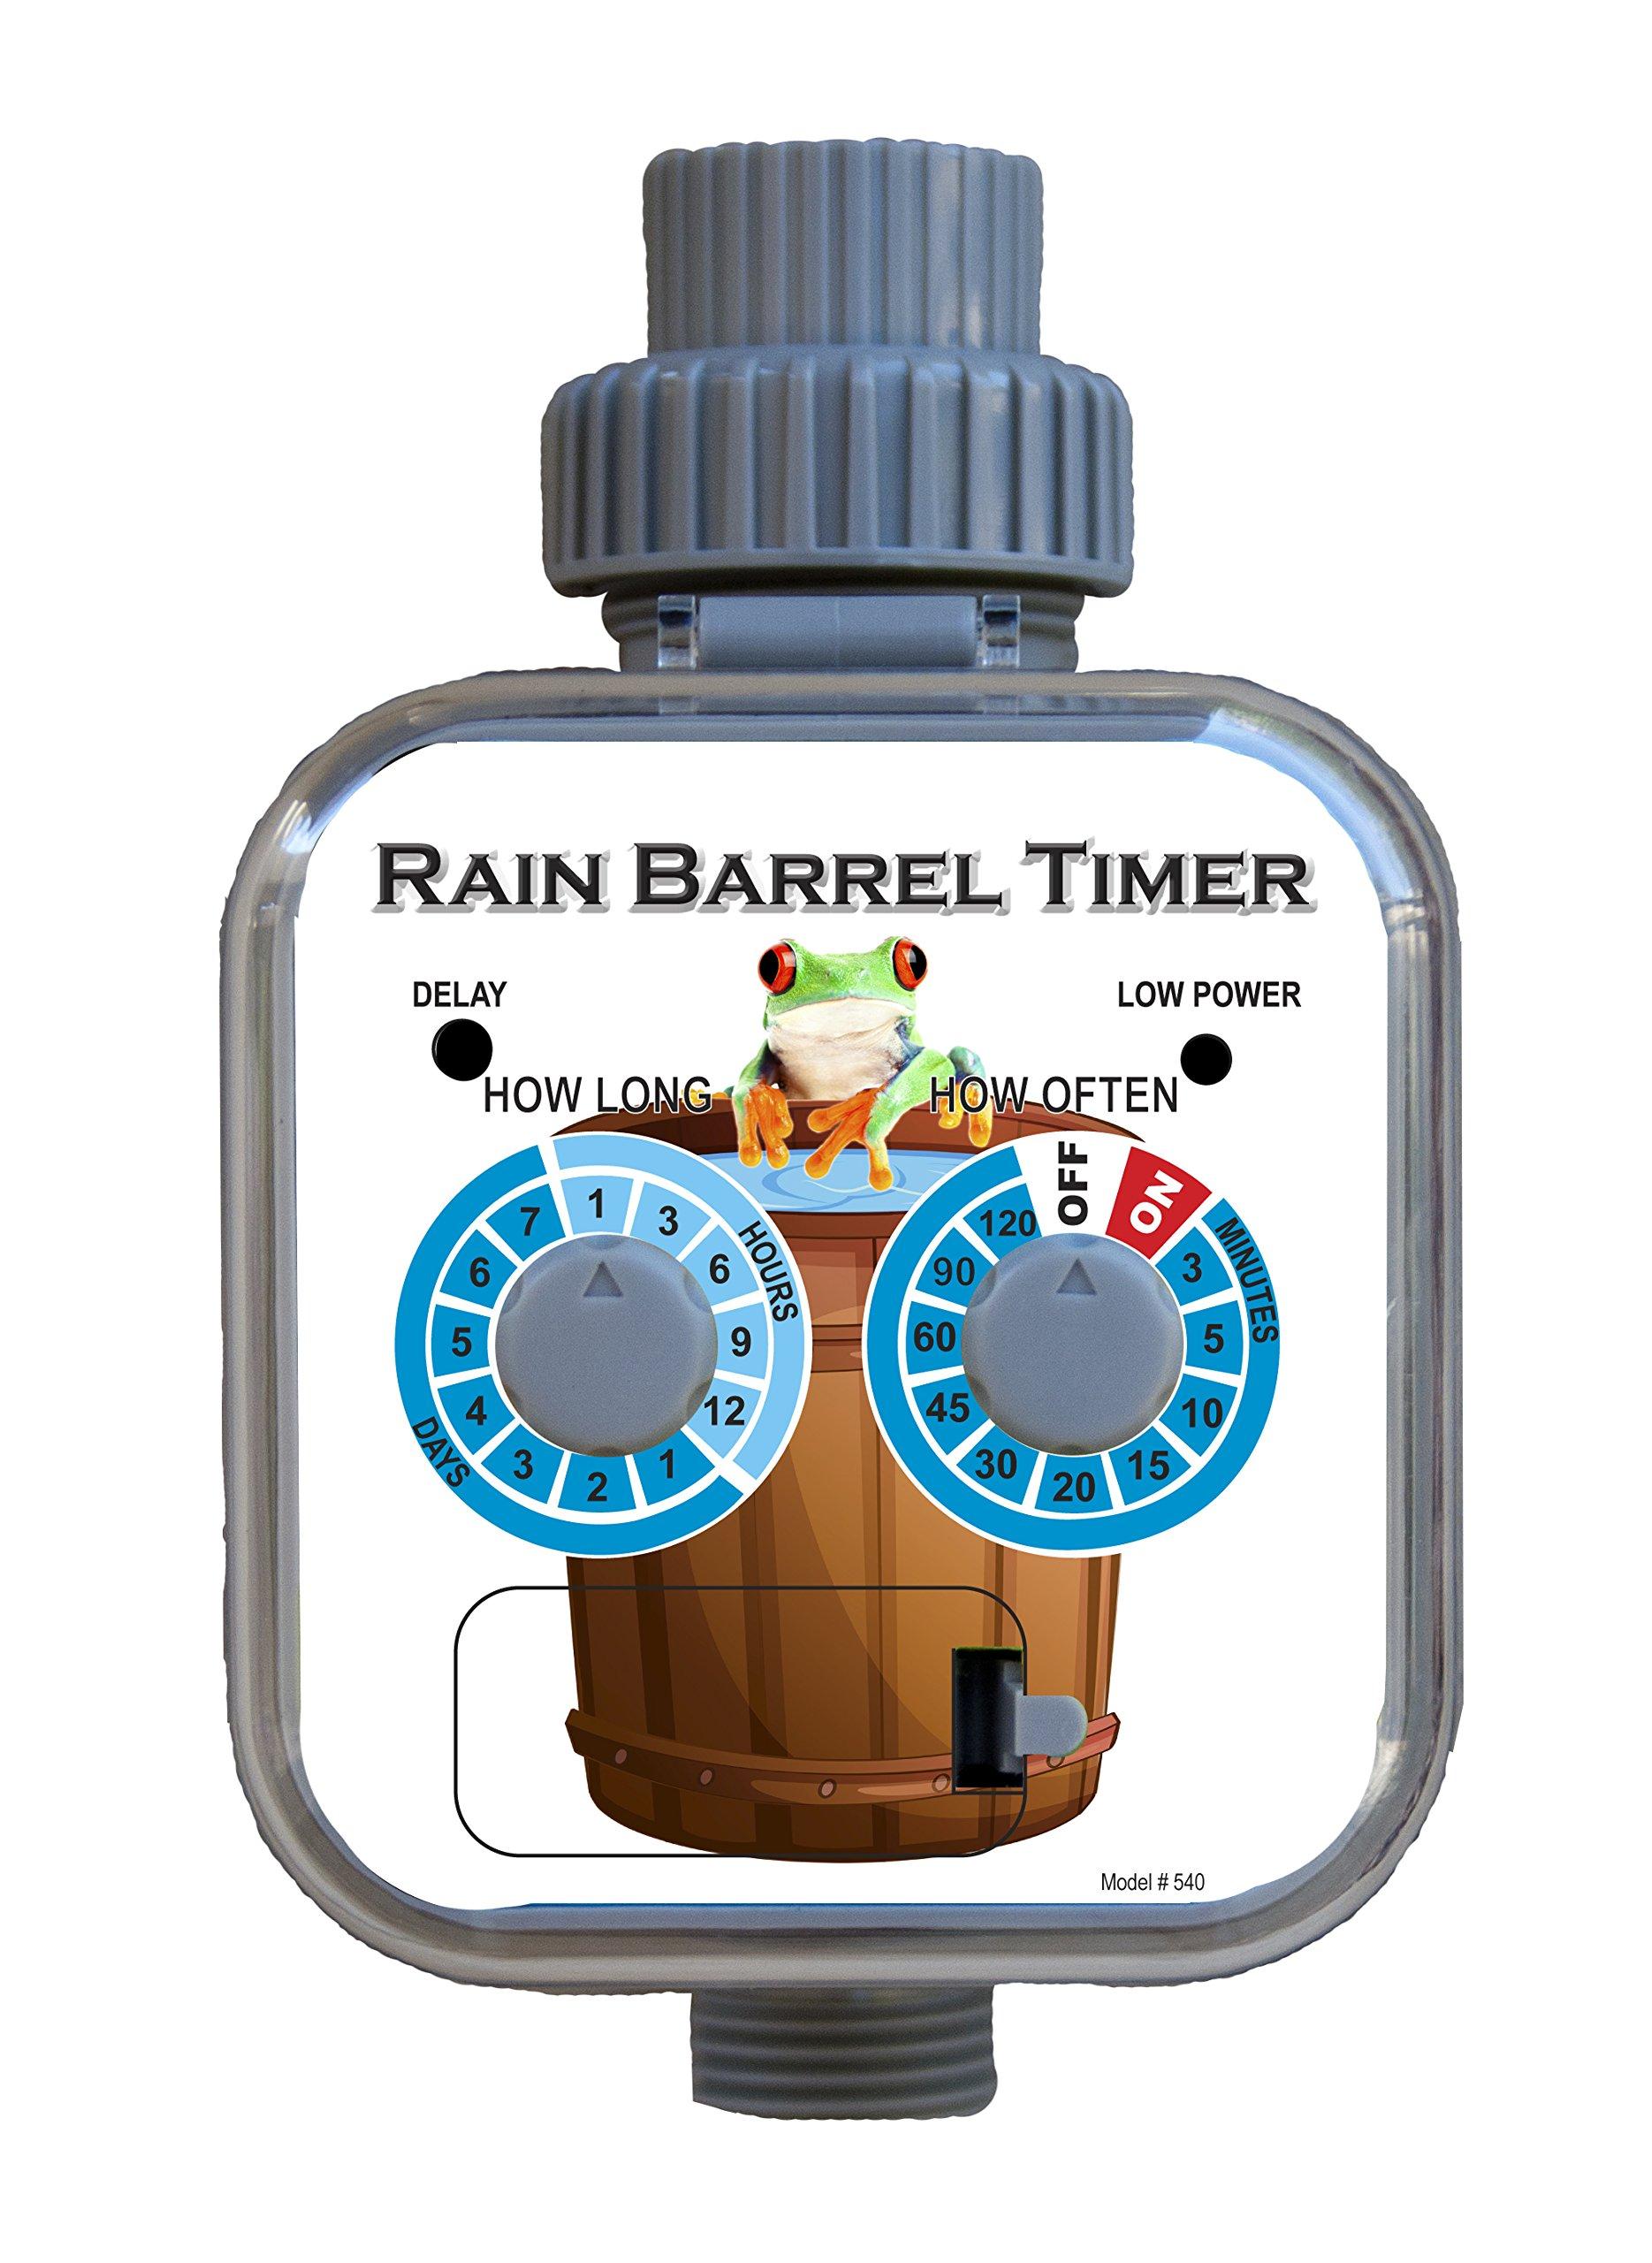 #193T Rain Barrel Soaker Hose Kit w/ #540 Rain Barrel Timer by Mr. Soaker Hose